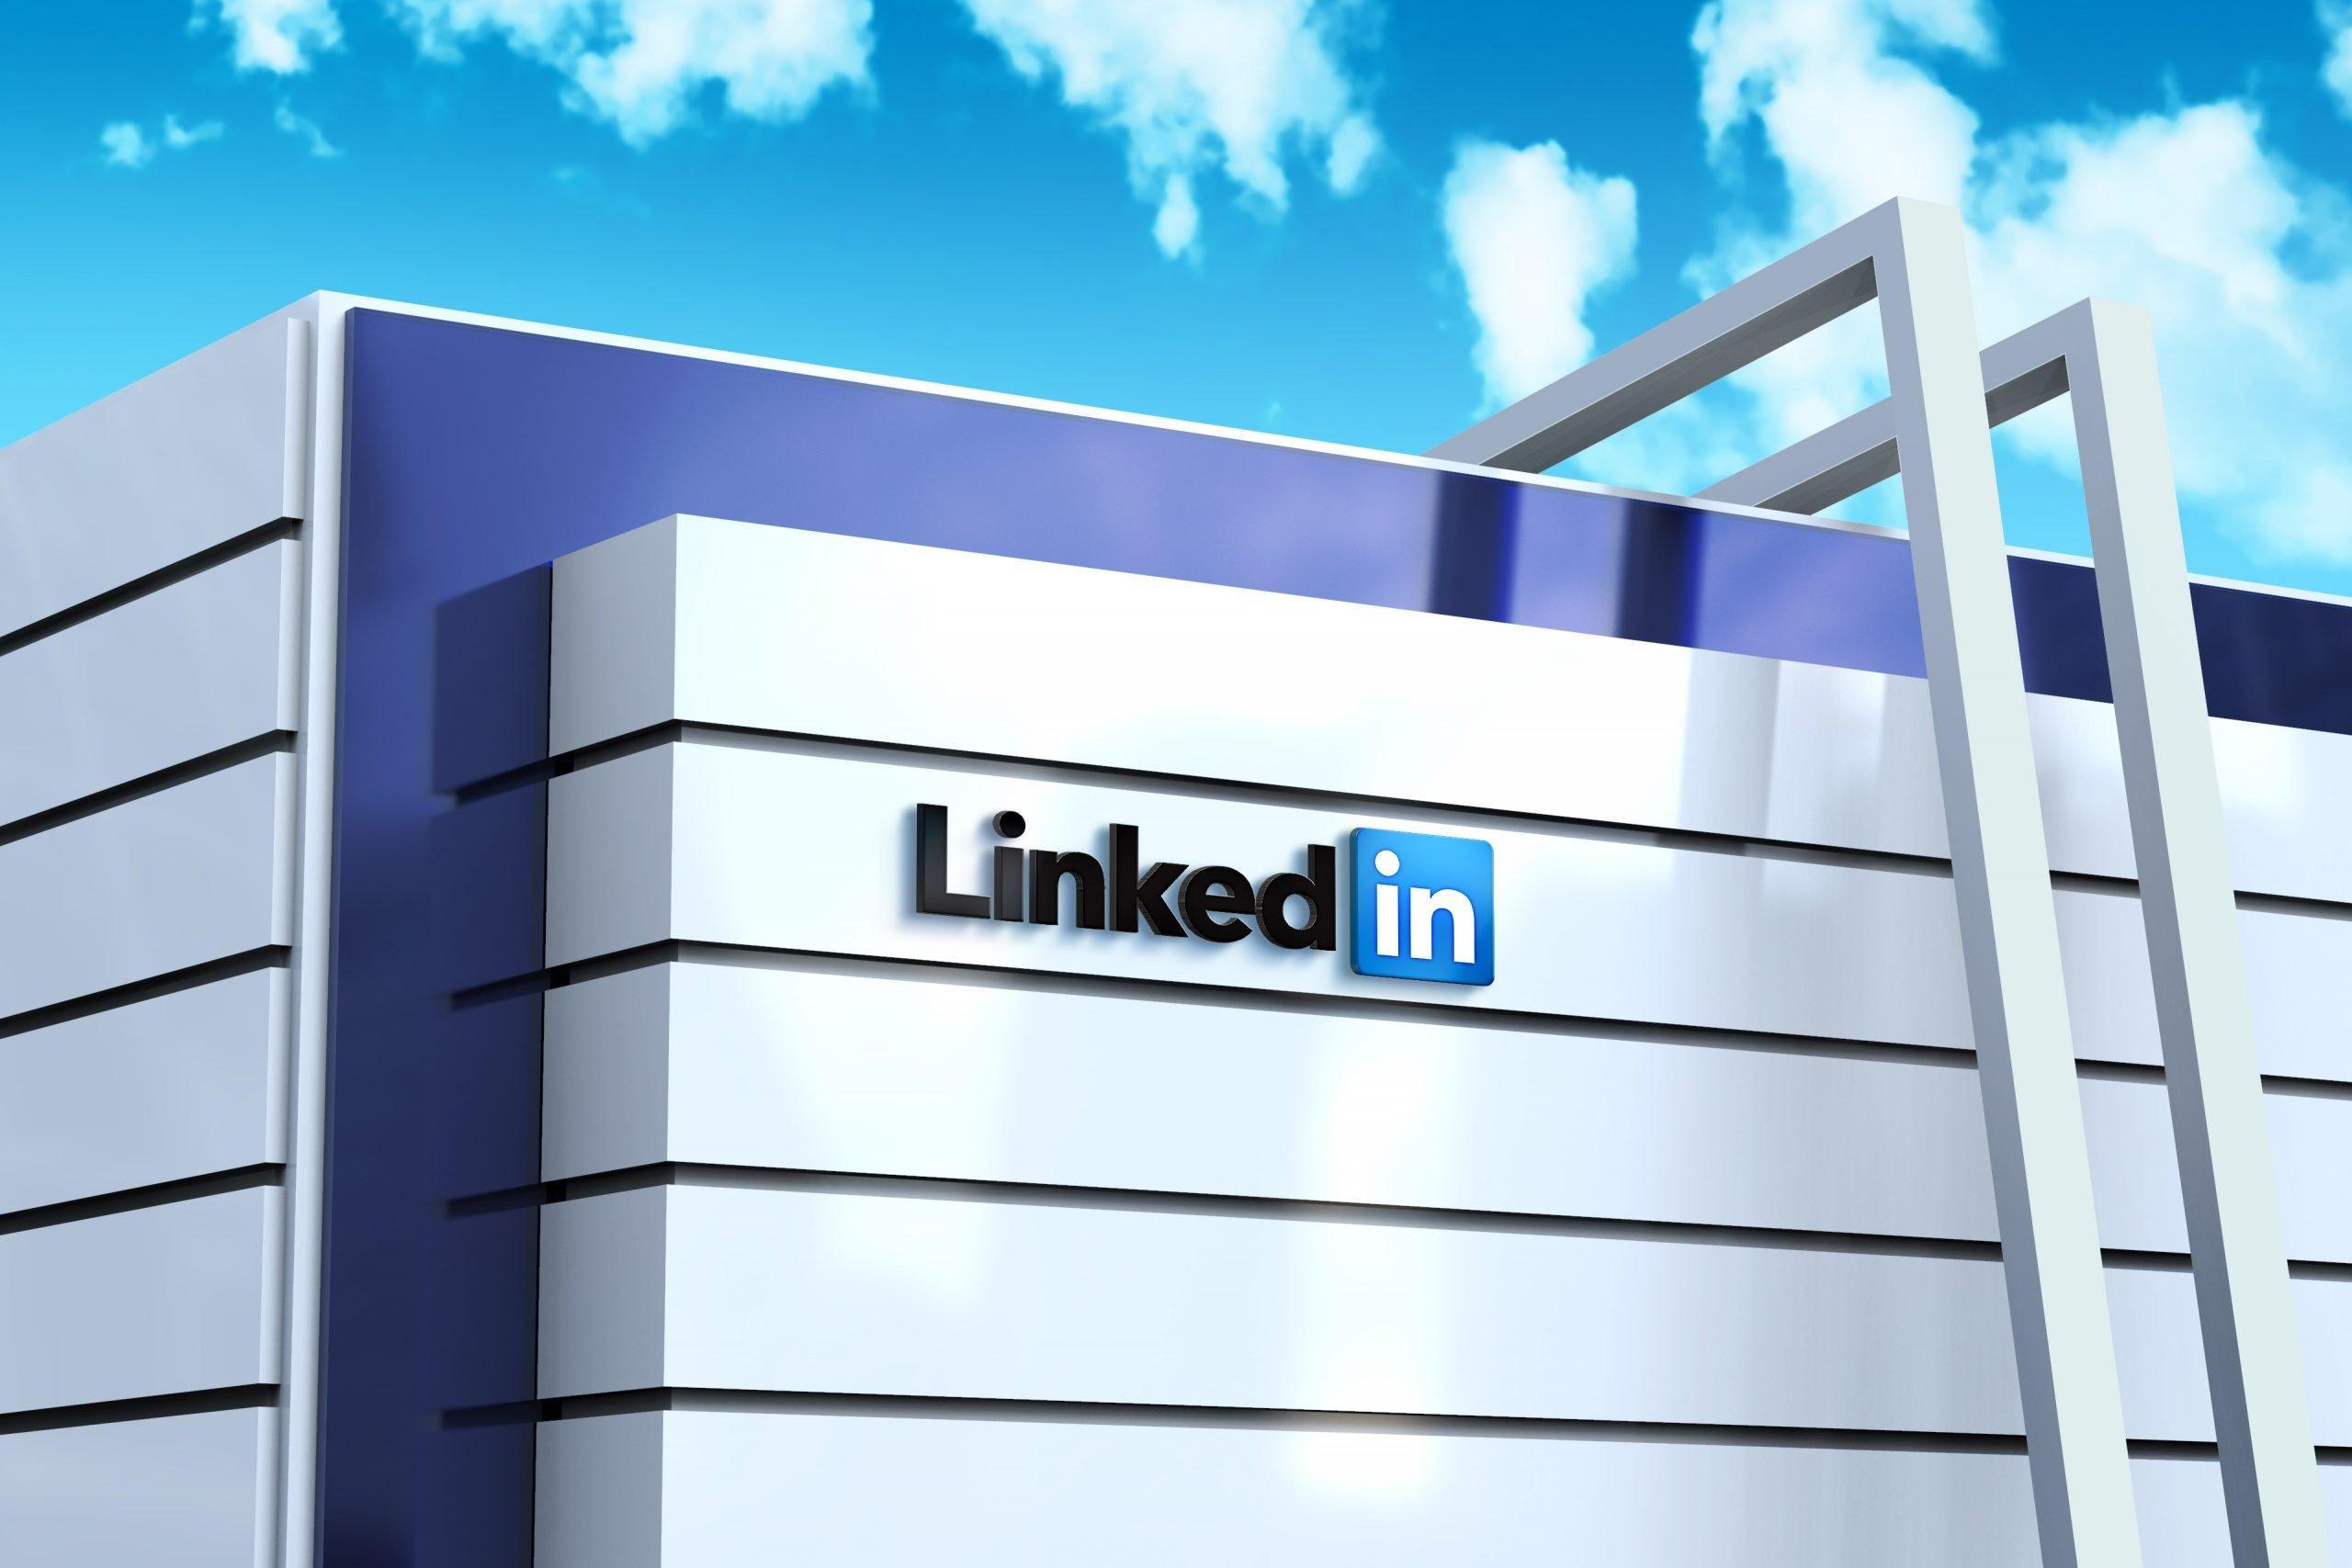 Linkedin-Logo-Example-Modern-Building-Architecture-Logo-Mockup